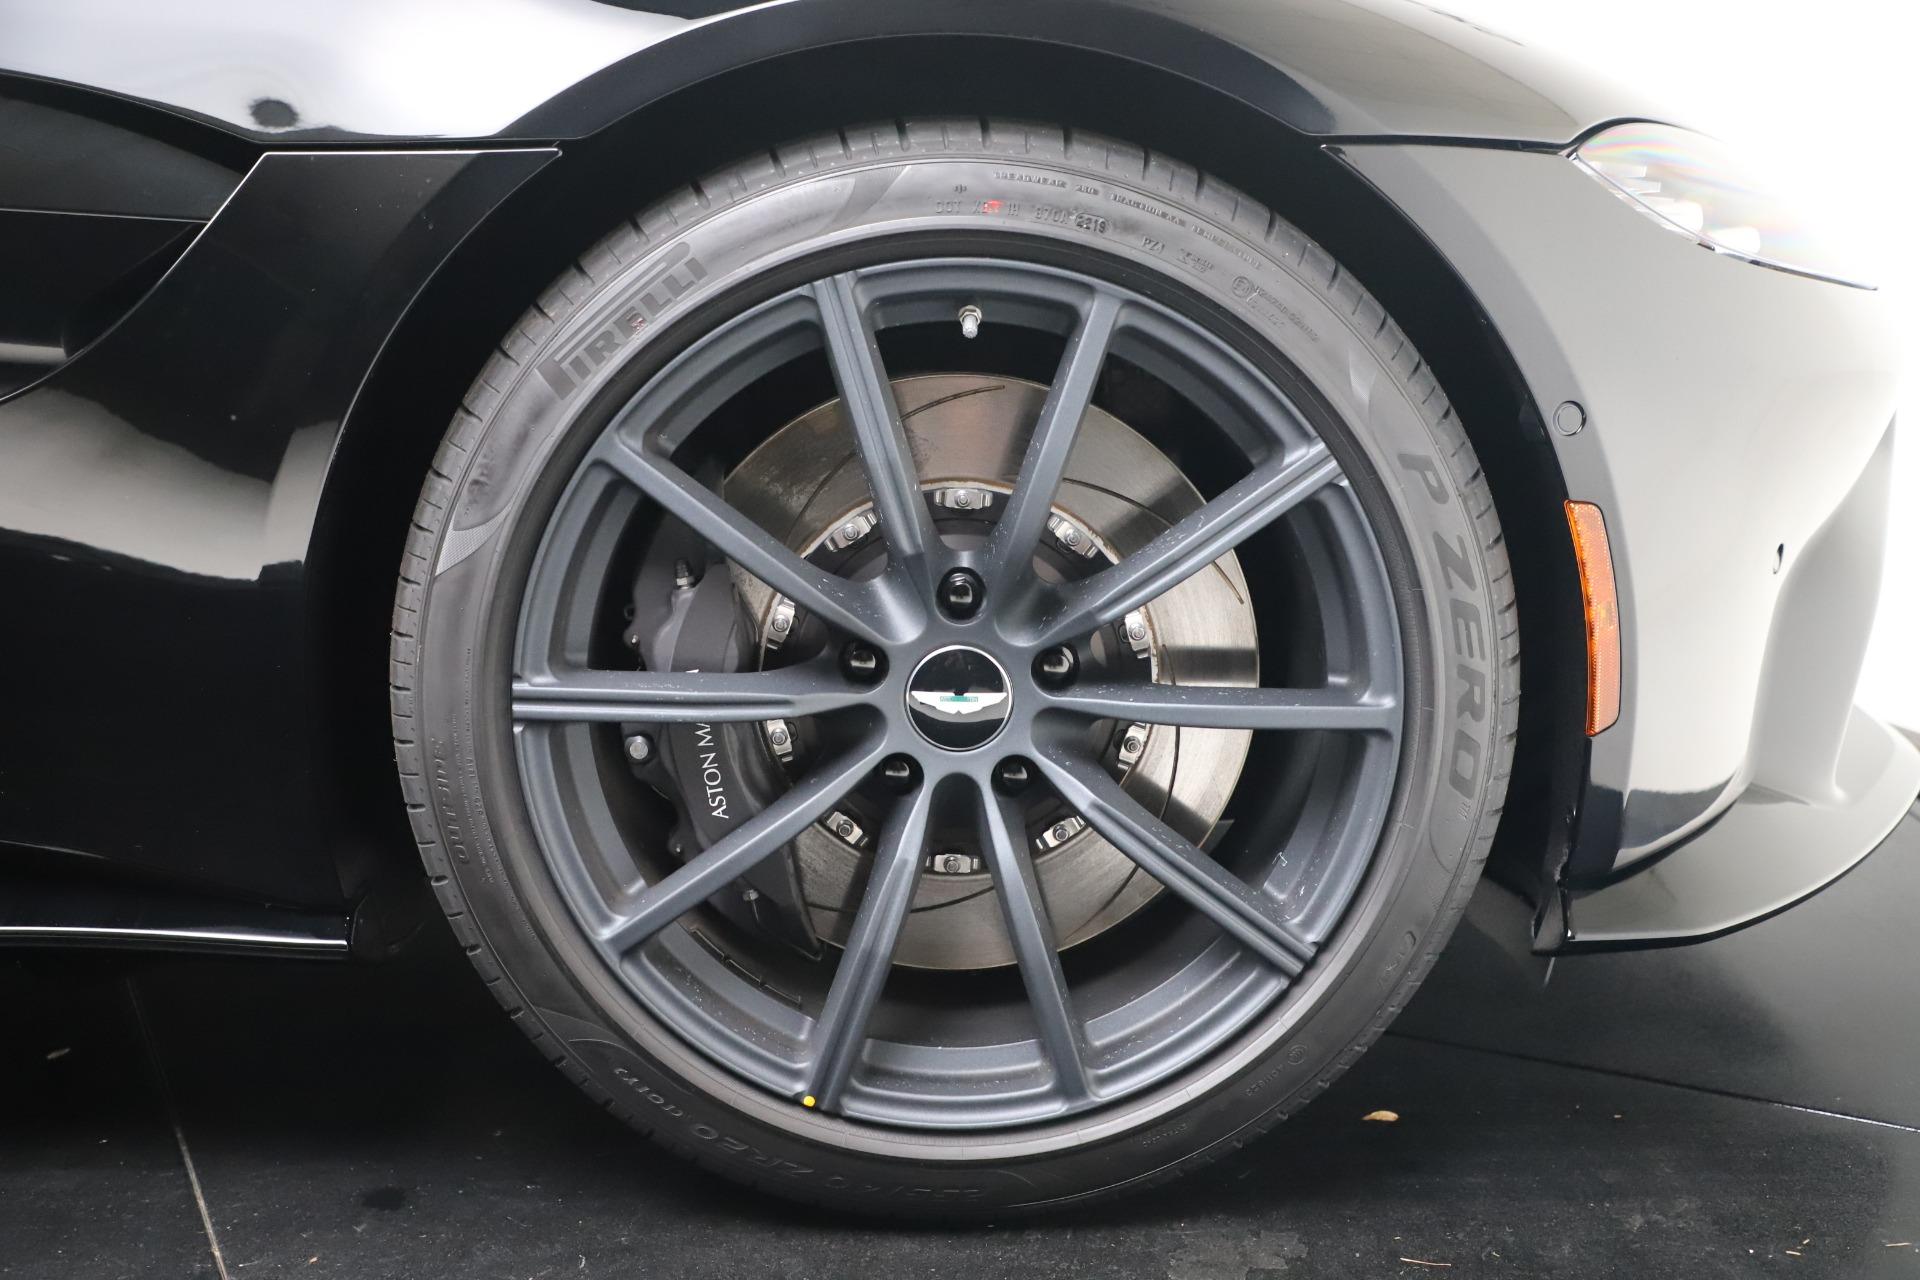 New 2020 Aston Martin Vantage V8 For Sale In Westport, CT 3547_p22